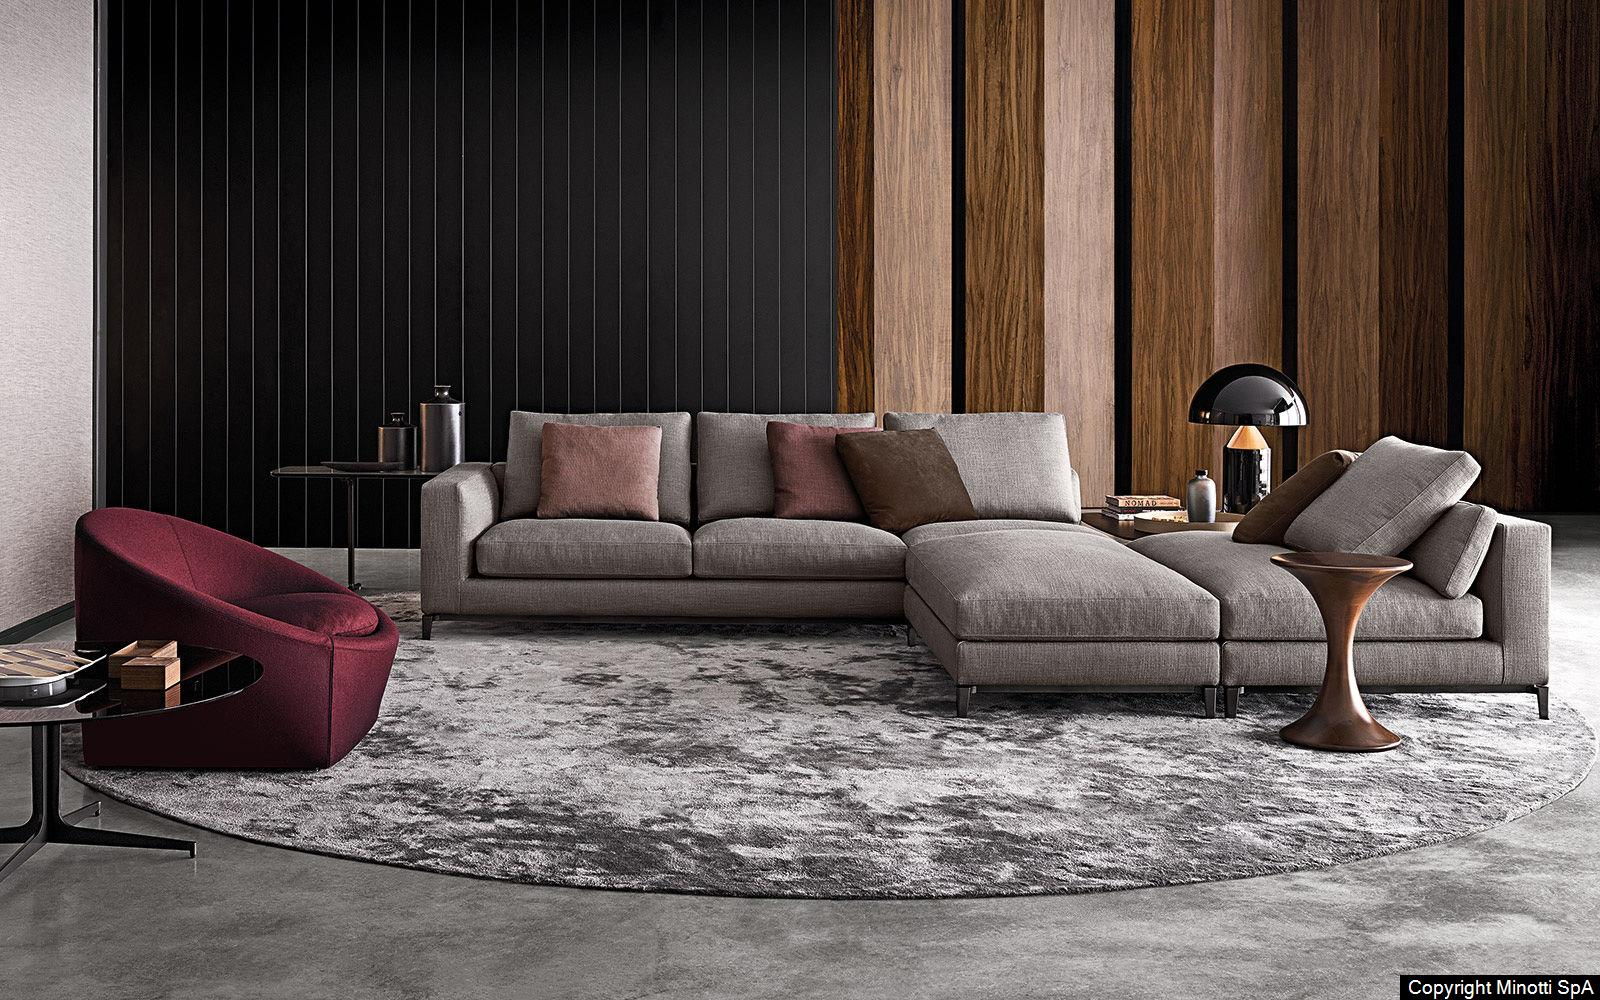 minotti raw interiors. Black Bedroom Furniture Sets. Home Design Ideas